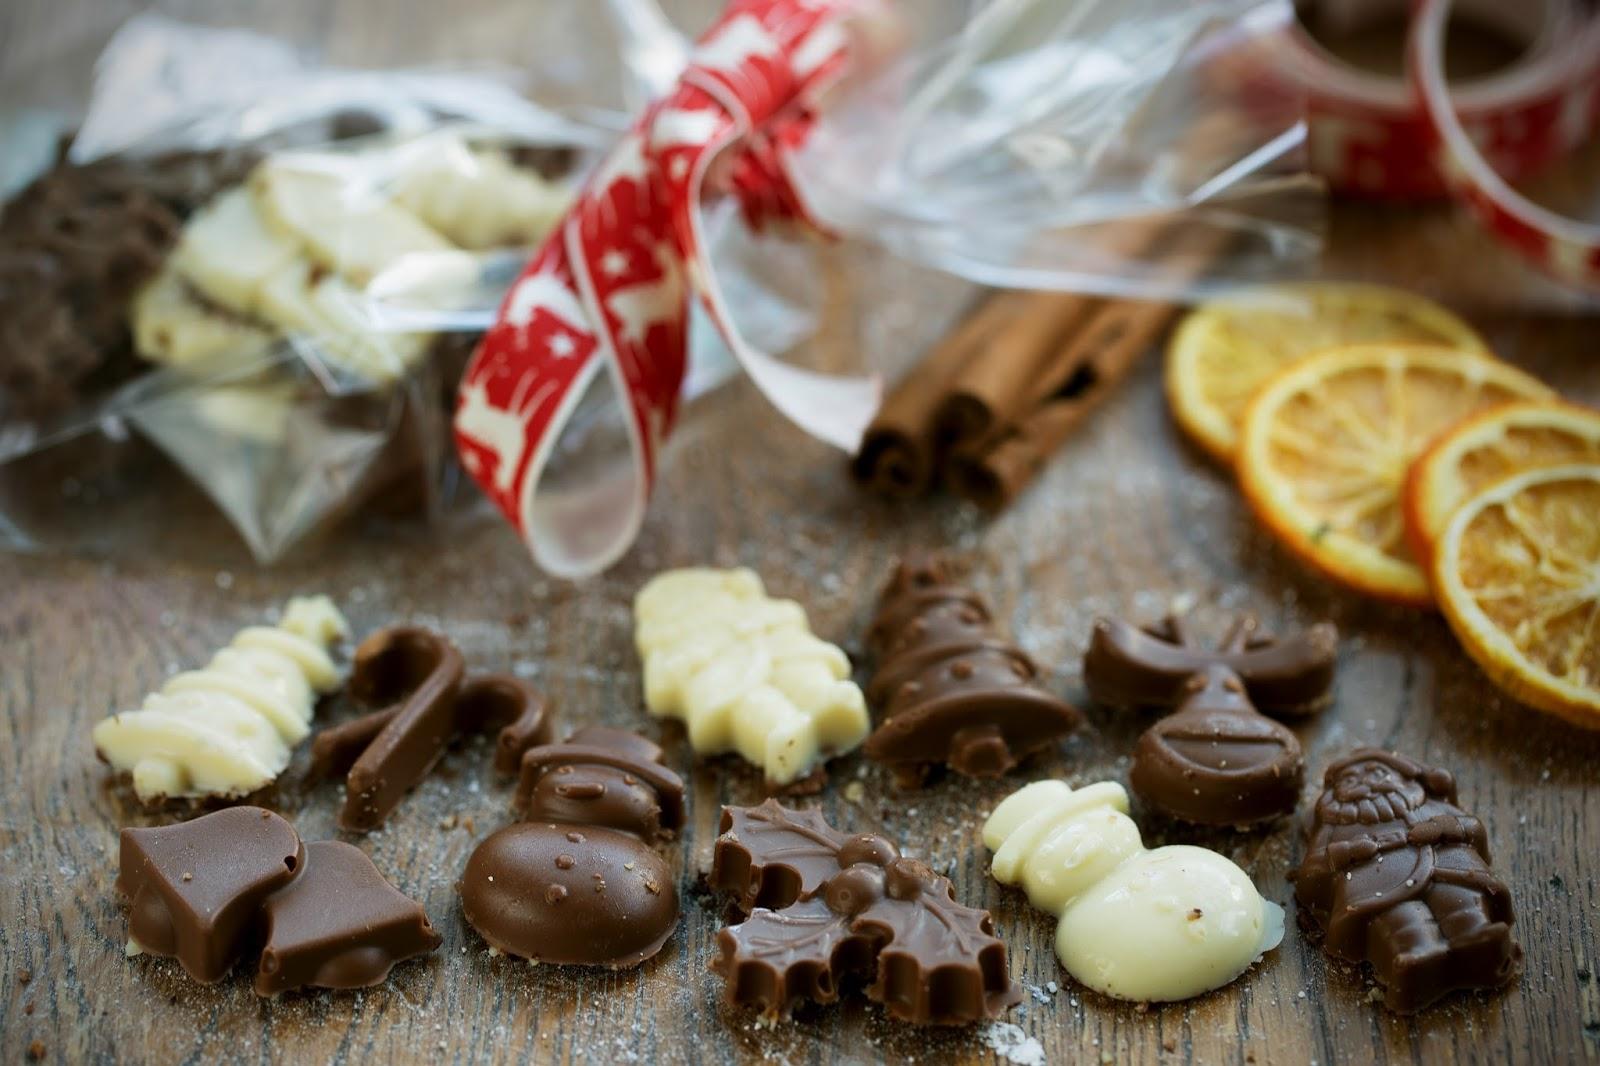 Christmas Chocolate Granola Gifts Ideas: Homemade